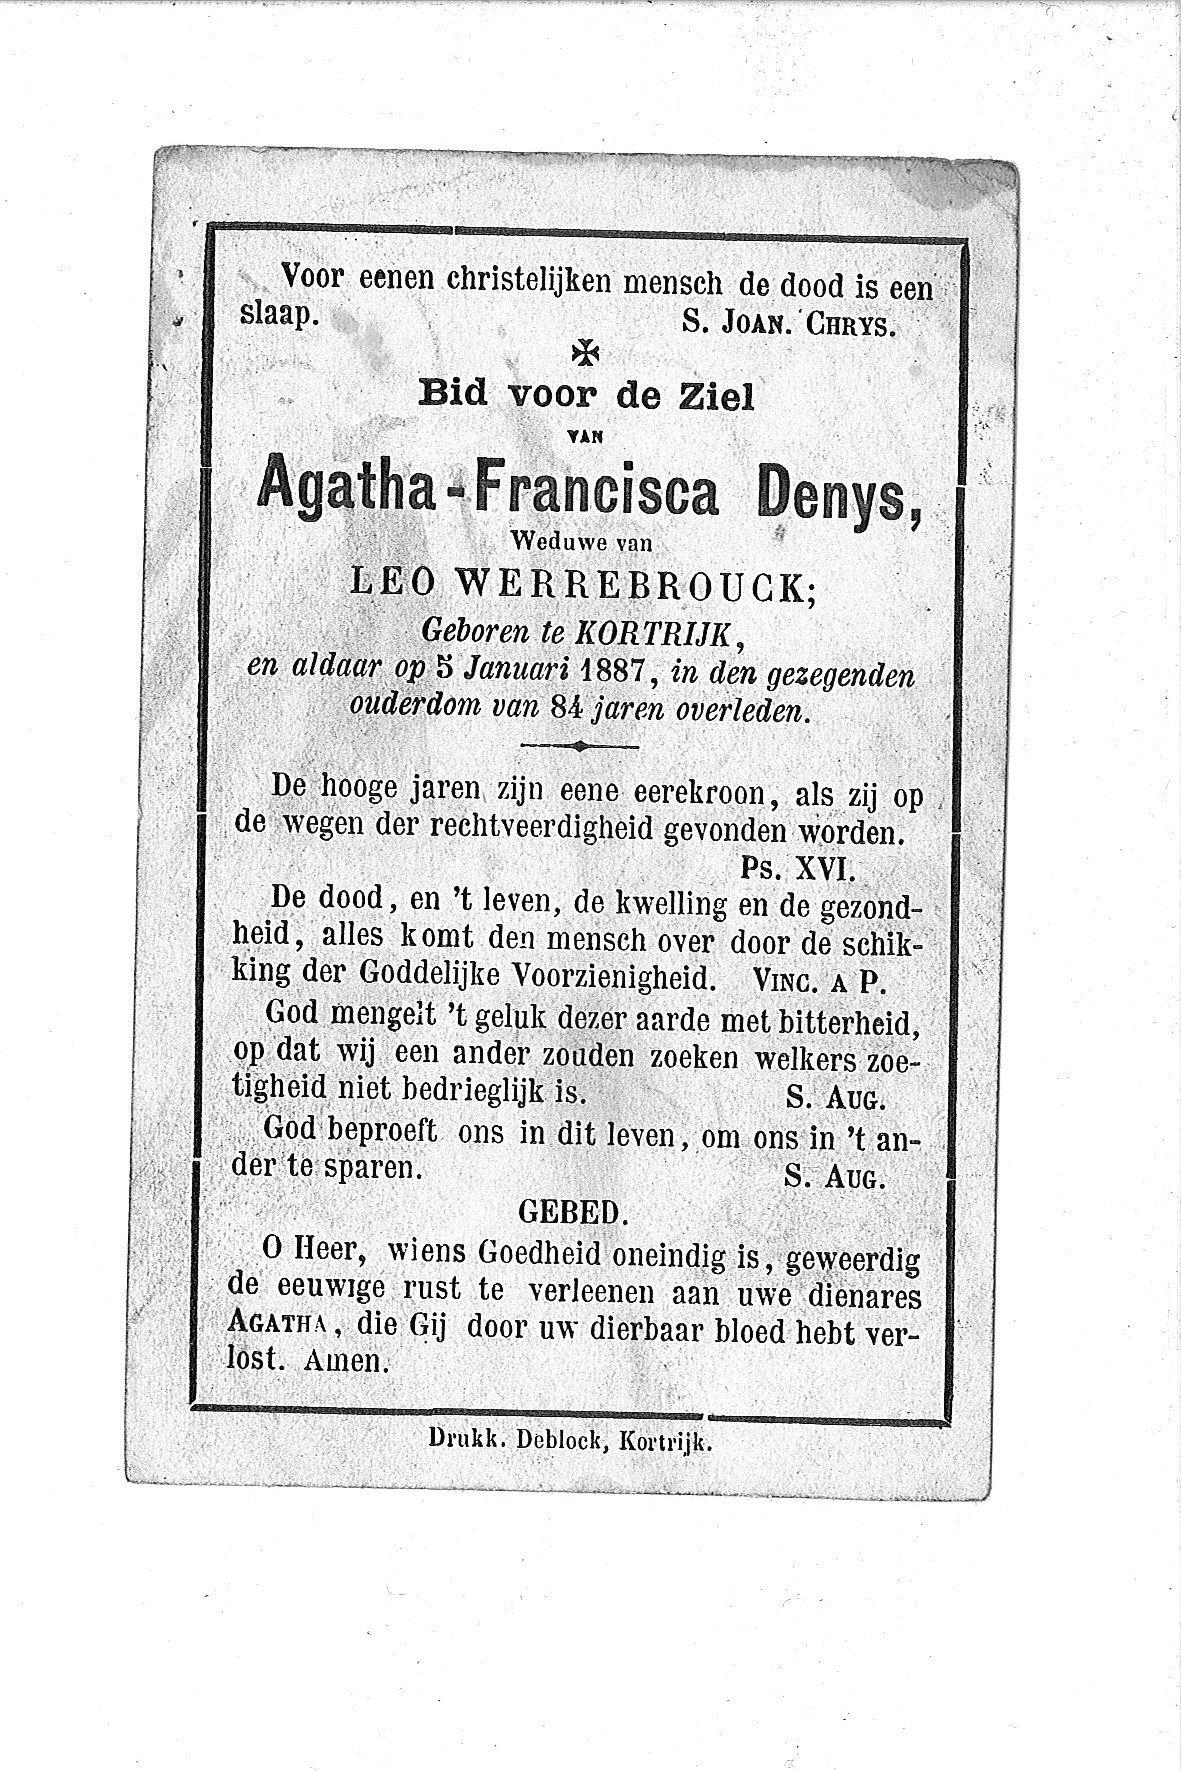 Agatha-Francisca(1887)20091002152051_00024.jpg